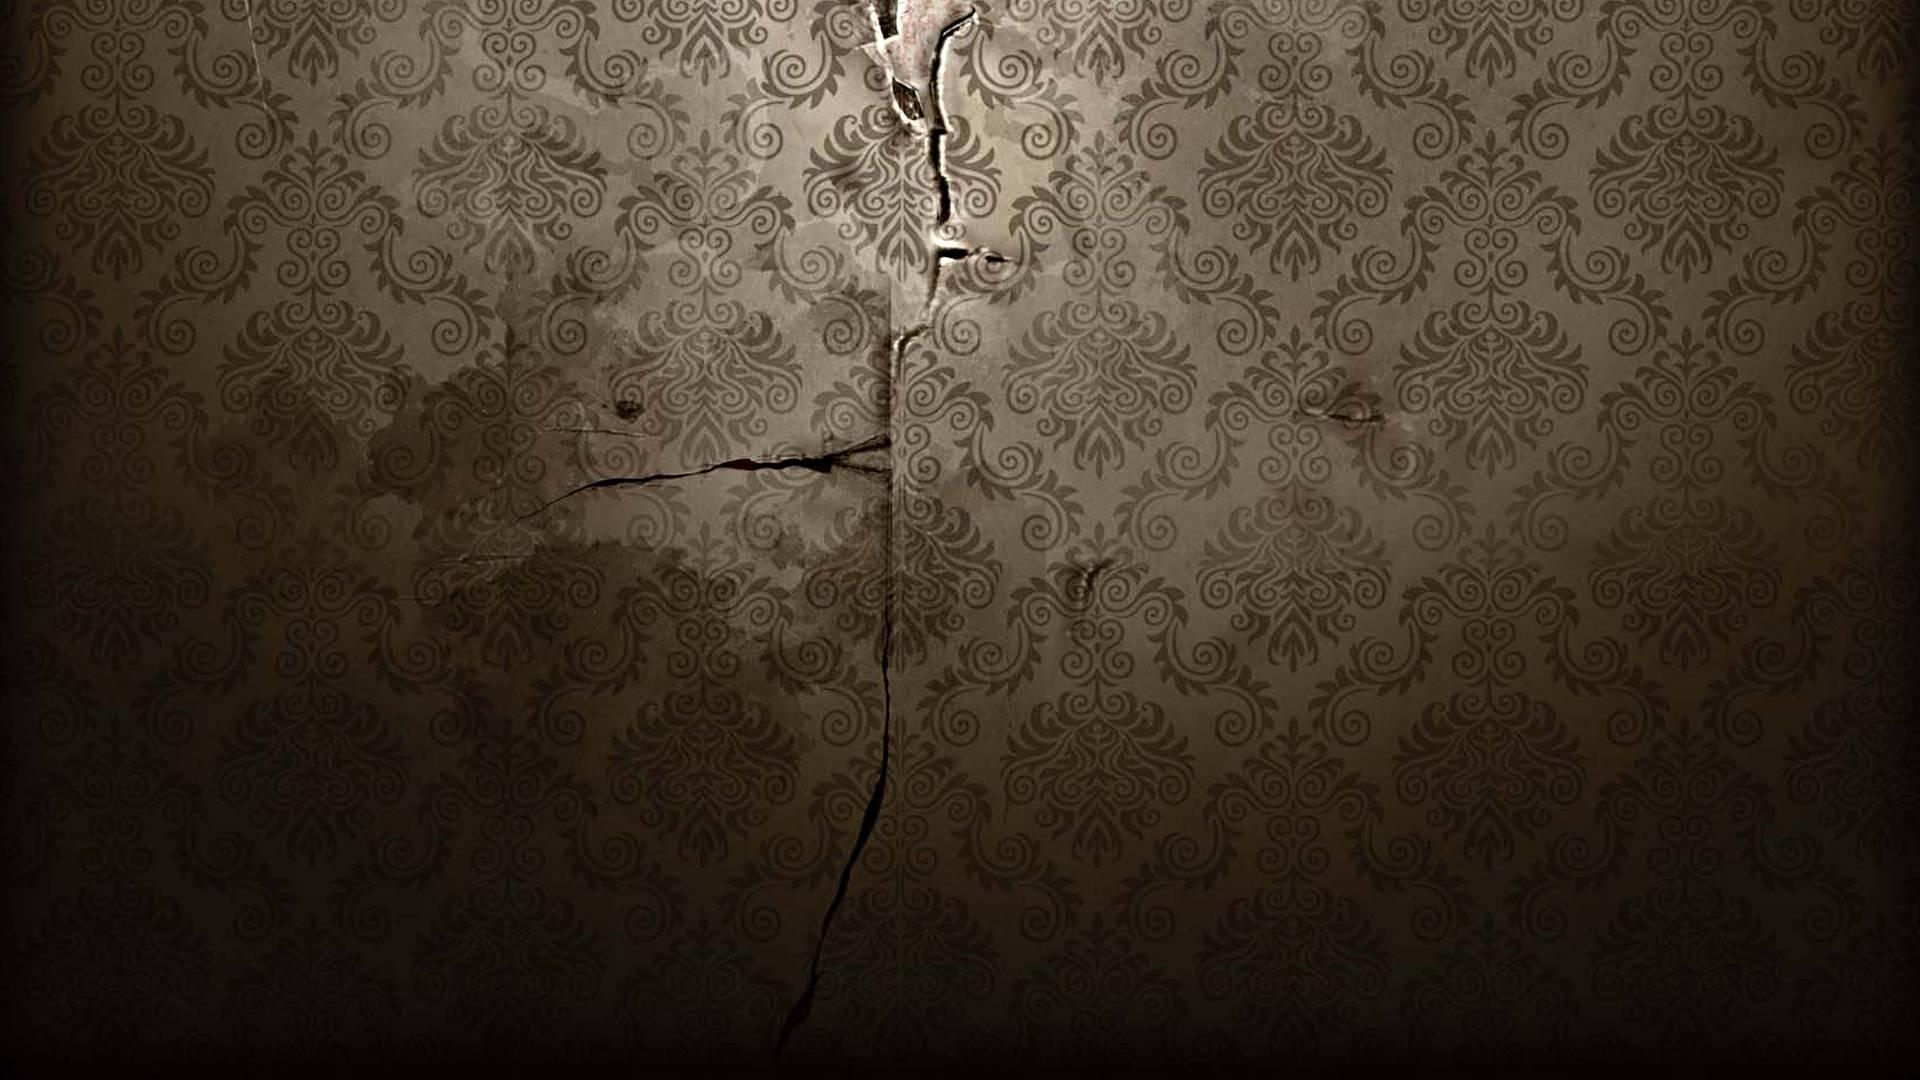 AMERICAN HORROR STORY horror thriller erotic american 1920x1080